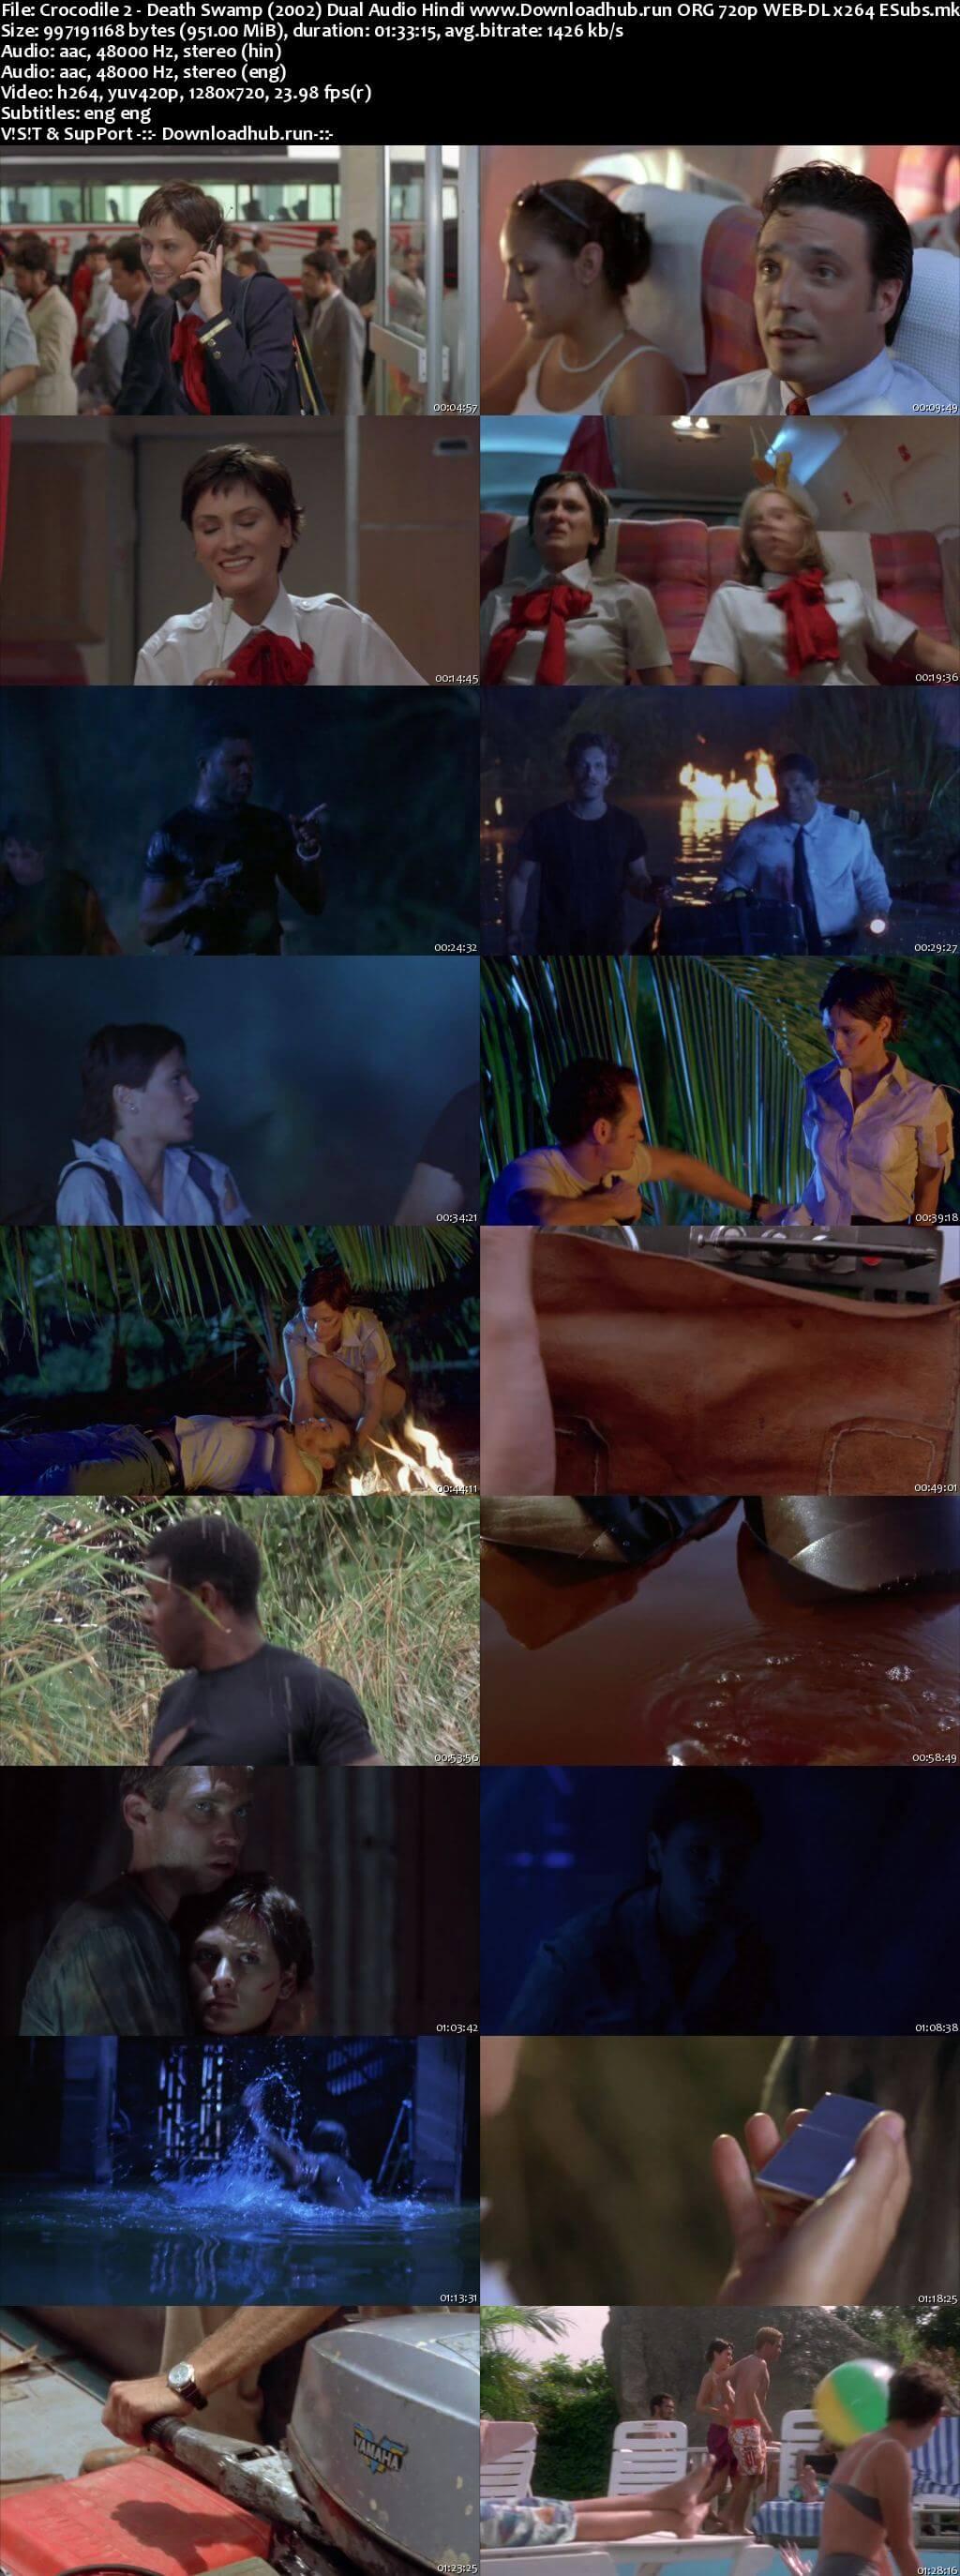 Crocodile 2 Death Swamp 2002 Hindi Dual Audio 720p Web-DL ESubs